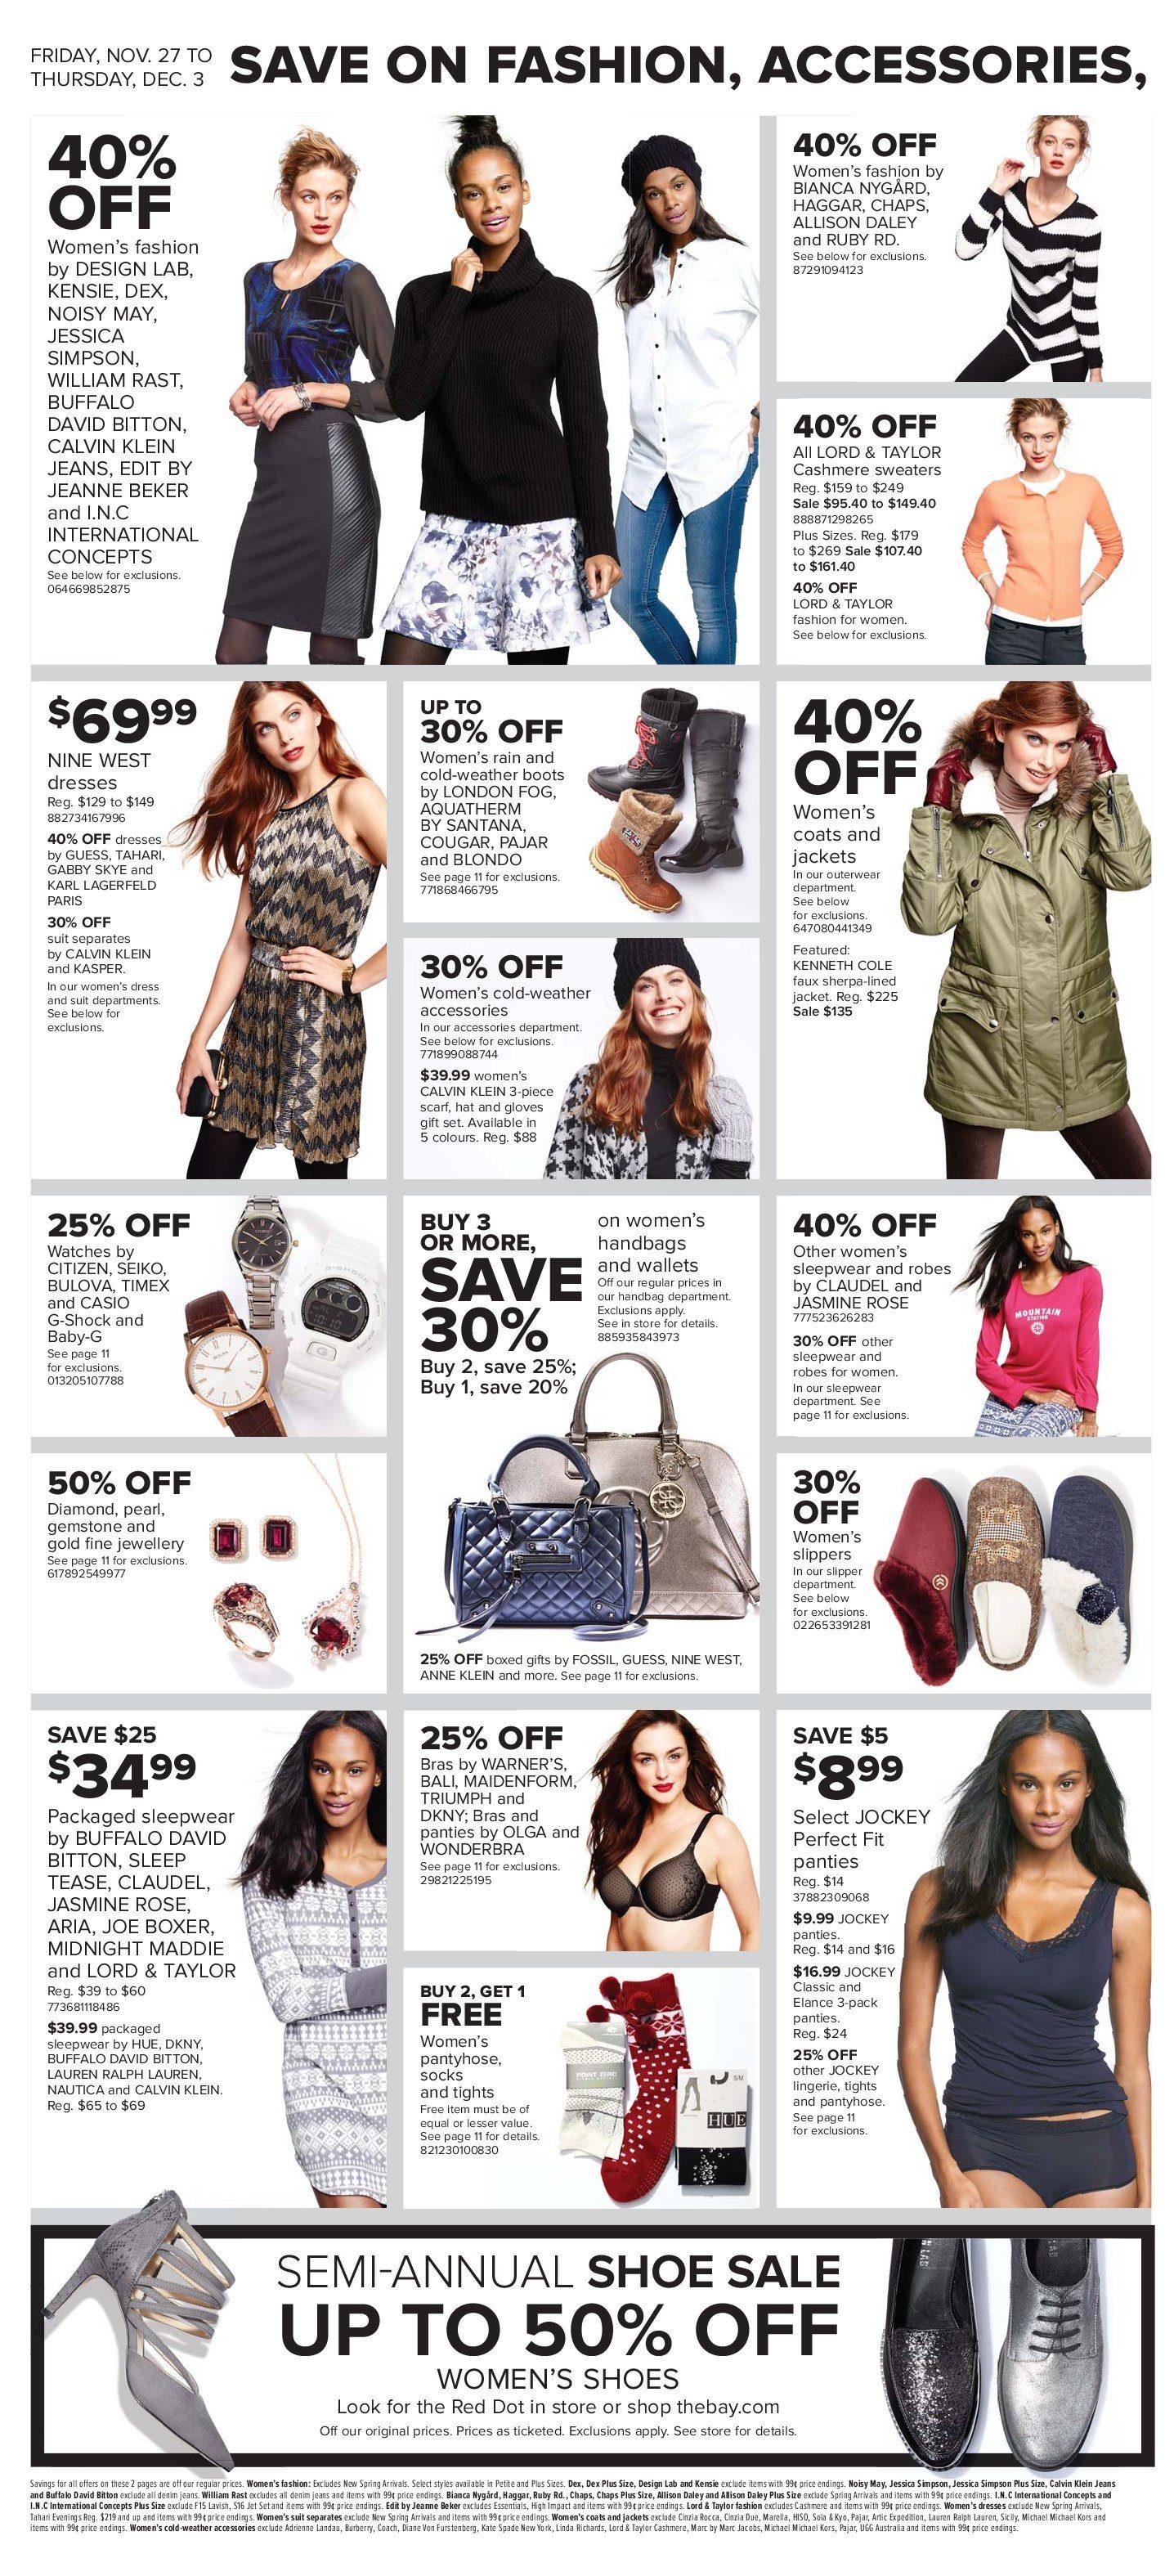 dd614f282d The Bay Weekly Flyer - Weekly - Black Friday Weekend Sale - Nov 27 – Dec 3  - RedFlagDeals.com